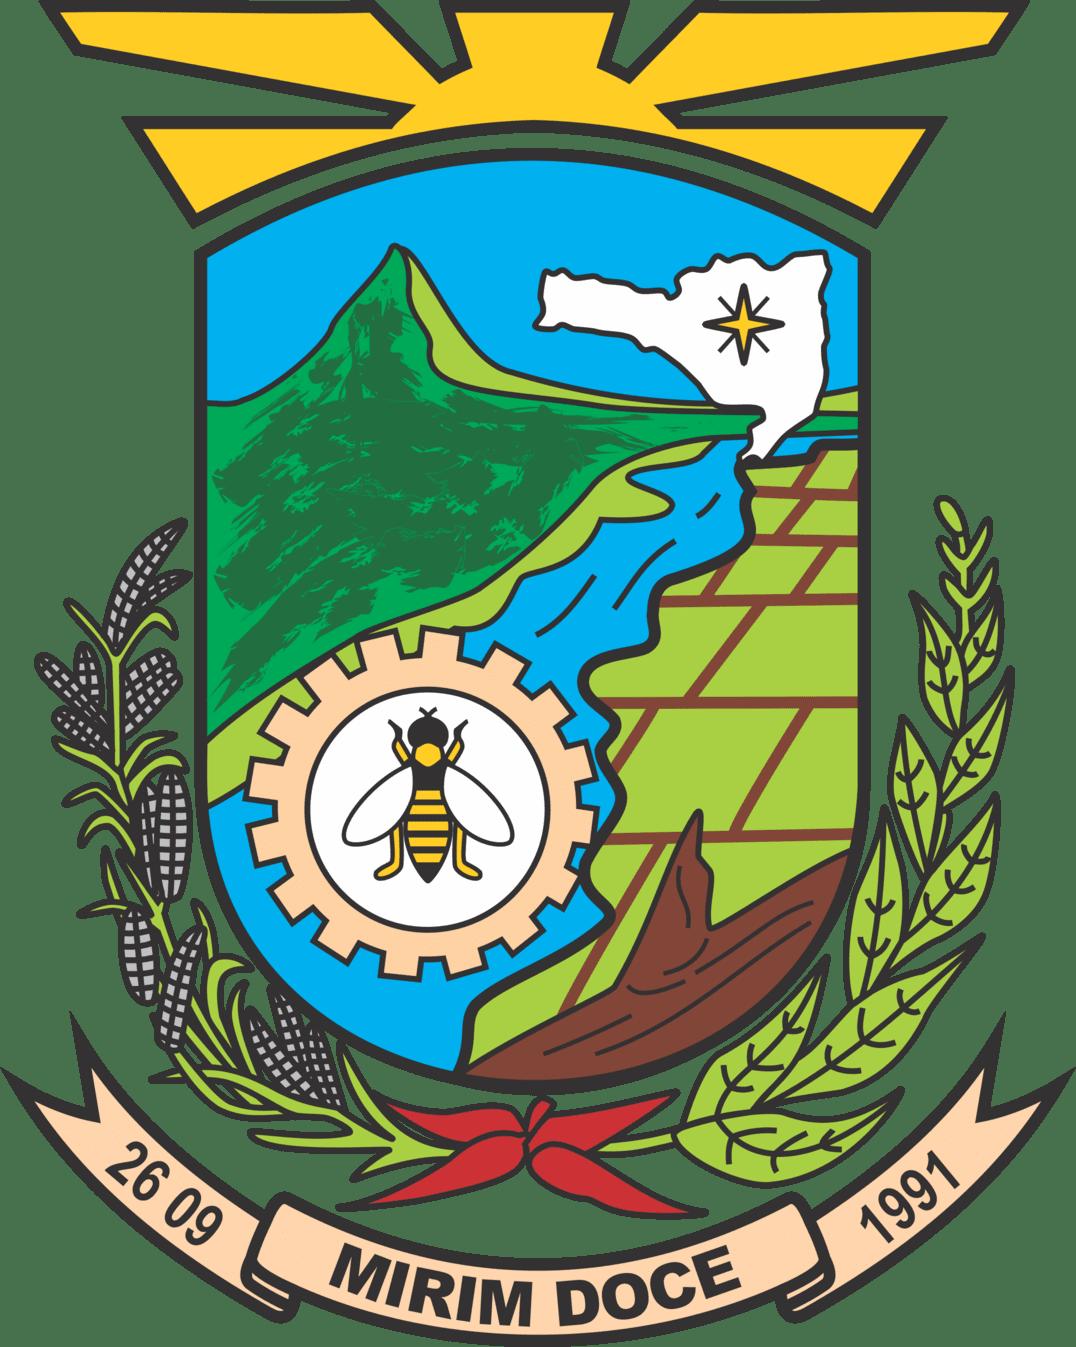 Logo da entidade Prefeitura Municipal de Mirim Doce